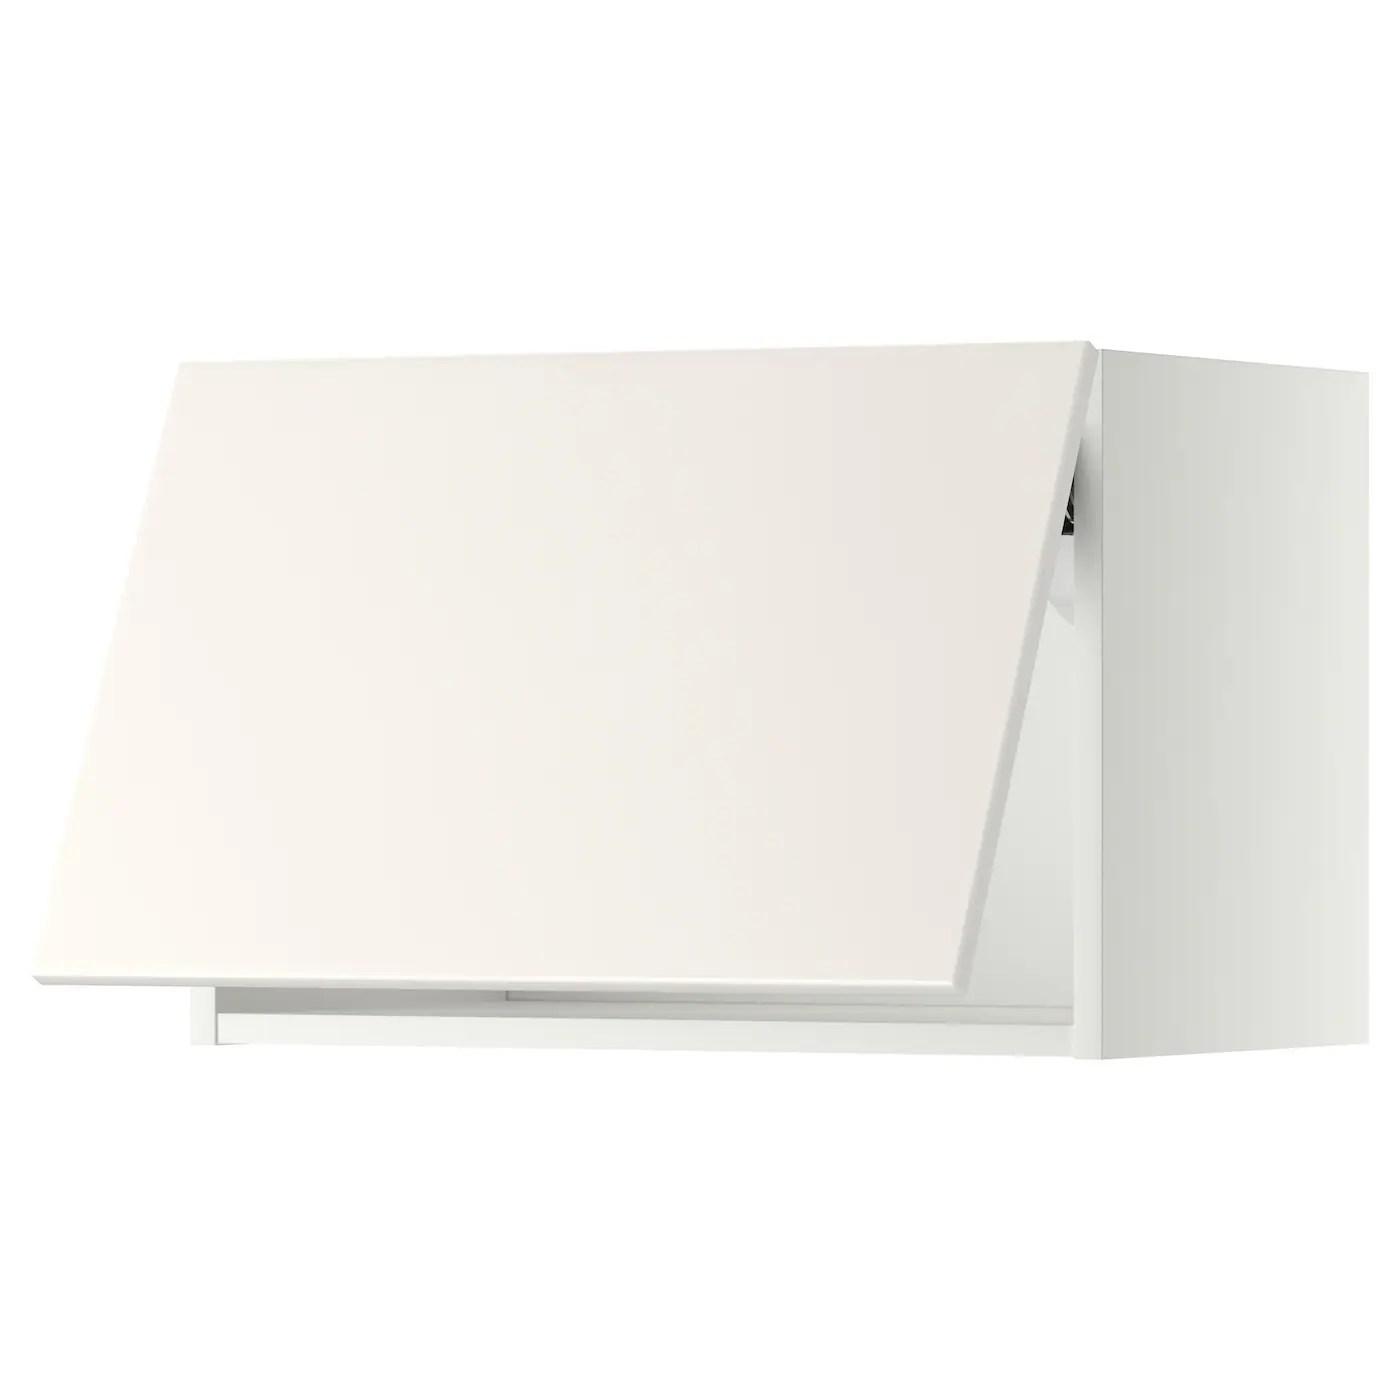 Scopri tutti i pensili su maisonplus. Metod Pensile Orizzontale Apertura Press Bianco Veddinge Bianco Ikea It